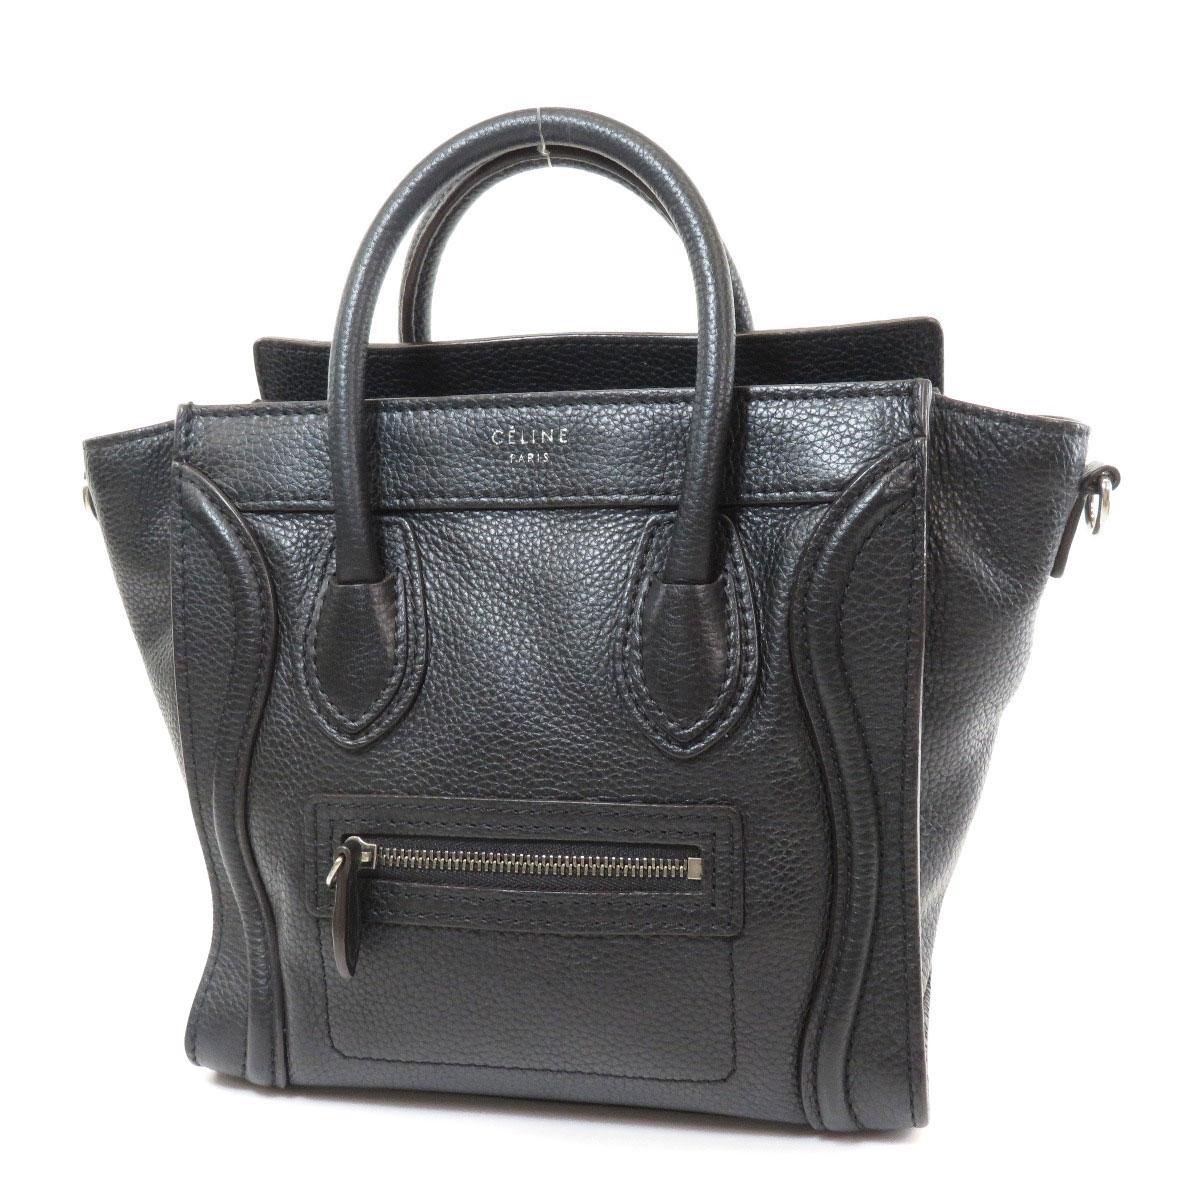 8ca7324b294c CELINE  Cerine  Handbag Calfskin Women ー The best place to buy ...